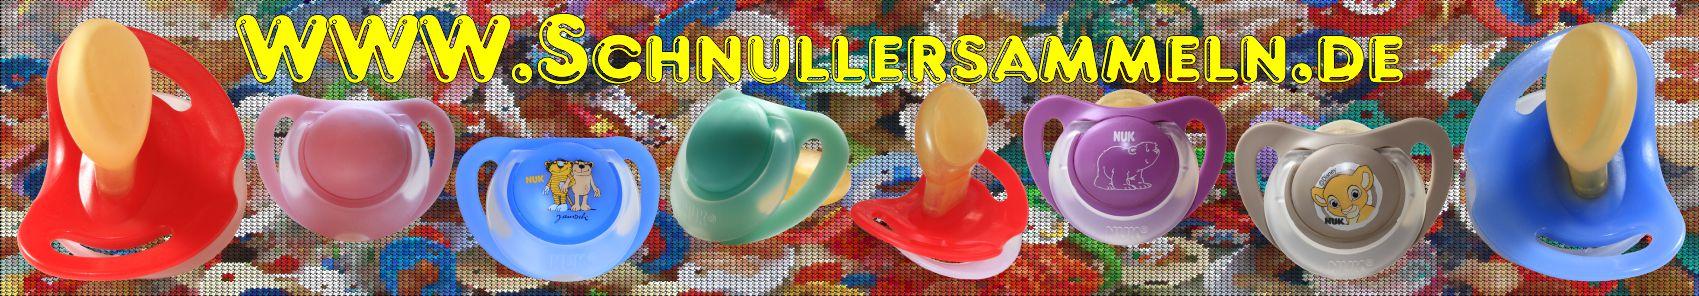 Schnuller Nuk Sammeln Nuckel